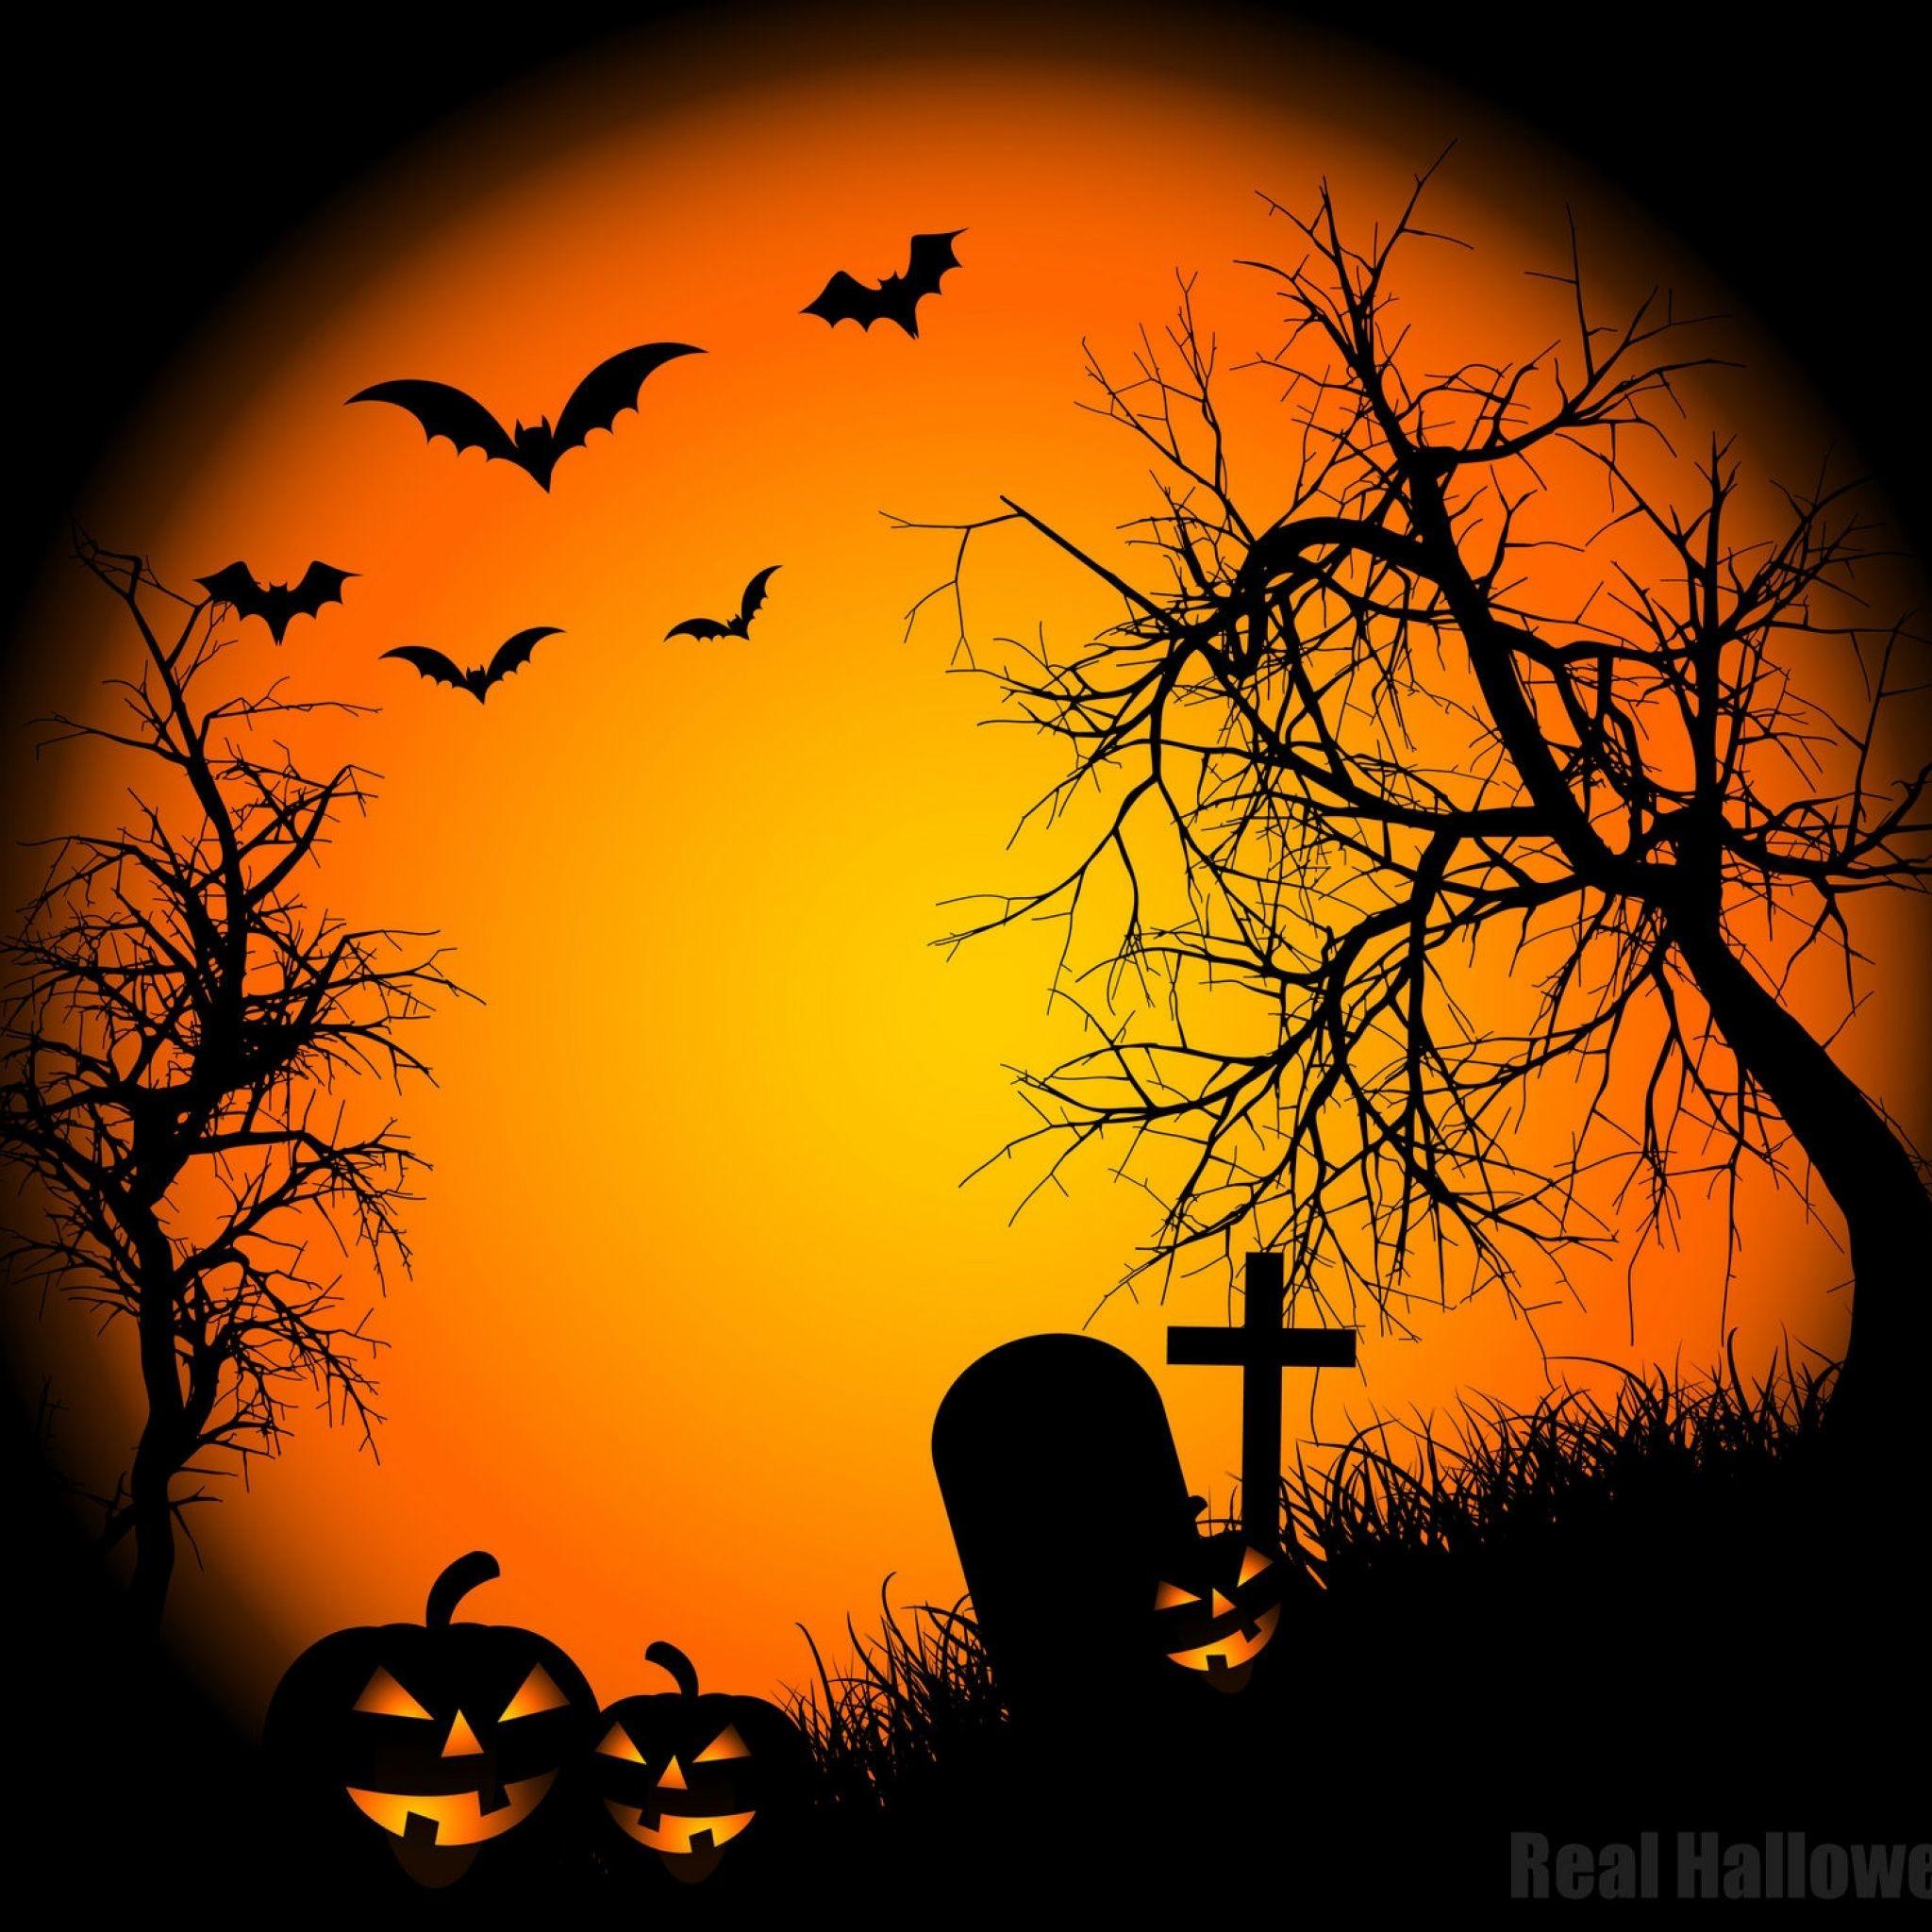 Cute Halloween IPhone Wallpaper (81+ Images